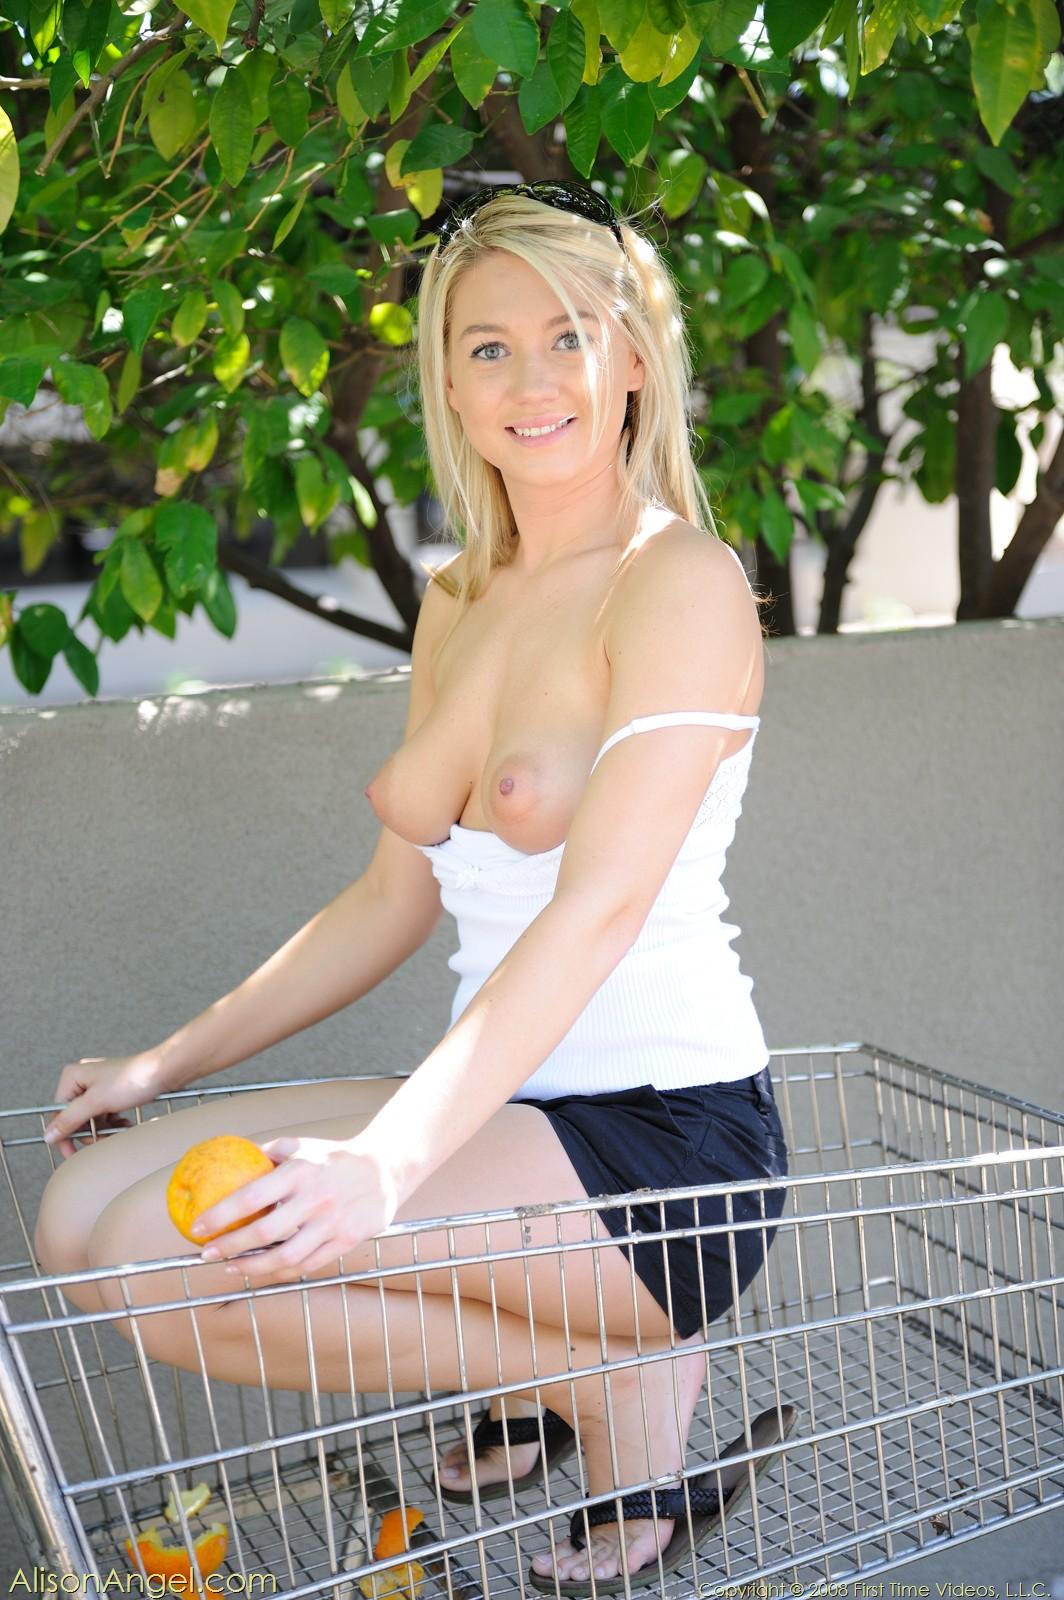 alison-angel-shopping-cart-oranges-blnde-naked-in-public-01